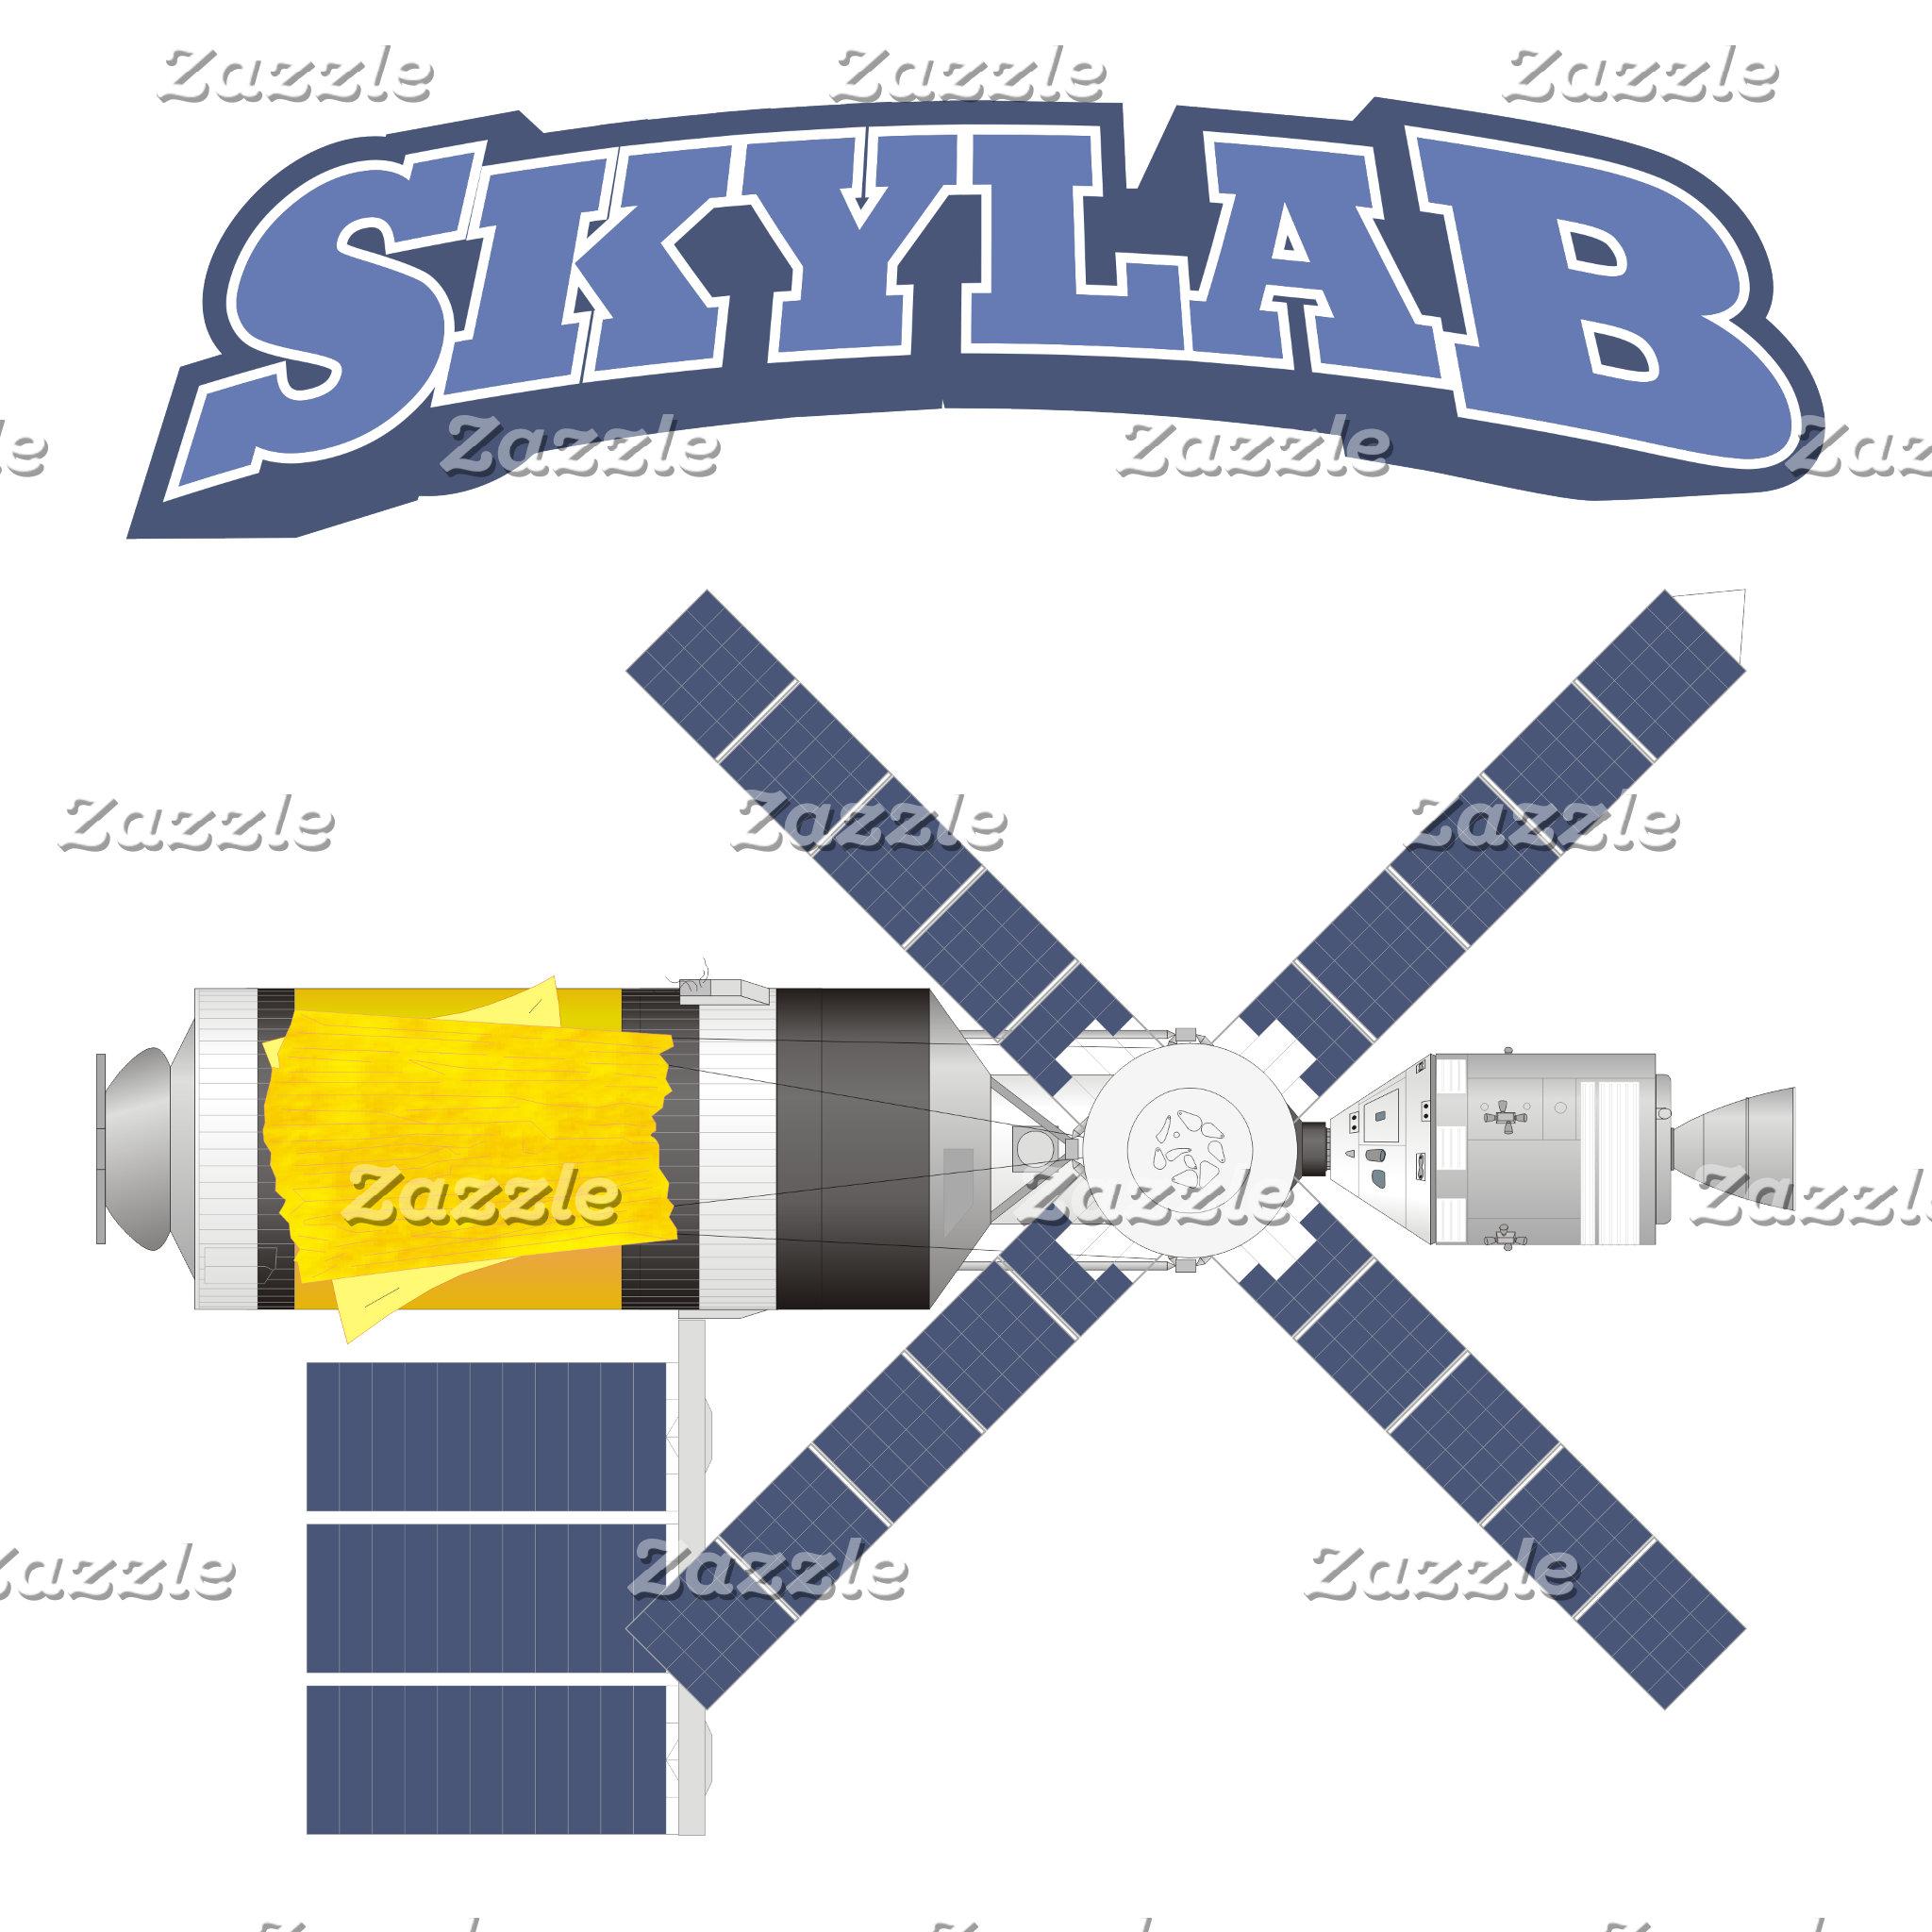 Skylab Space Station